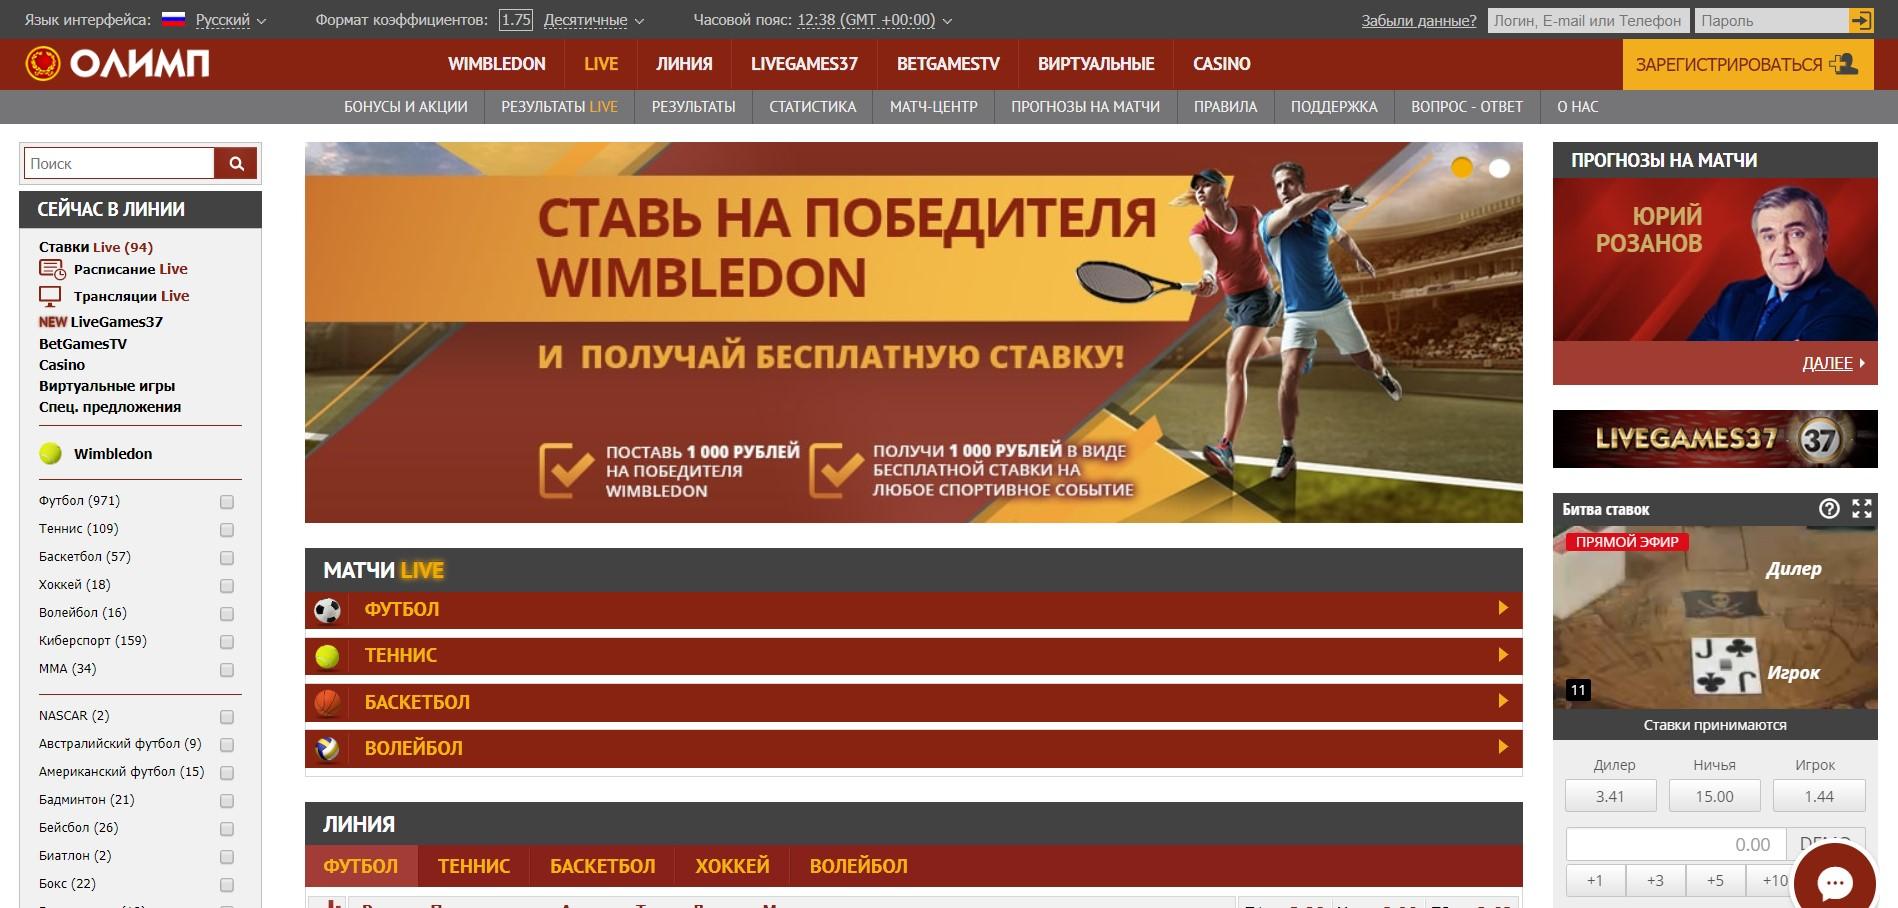 сайт олимп